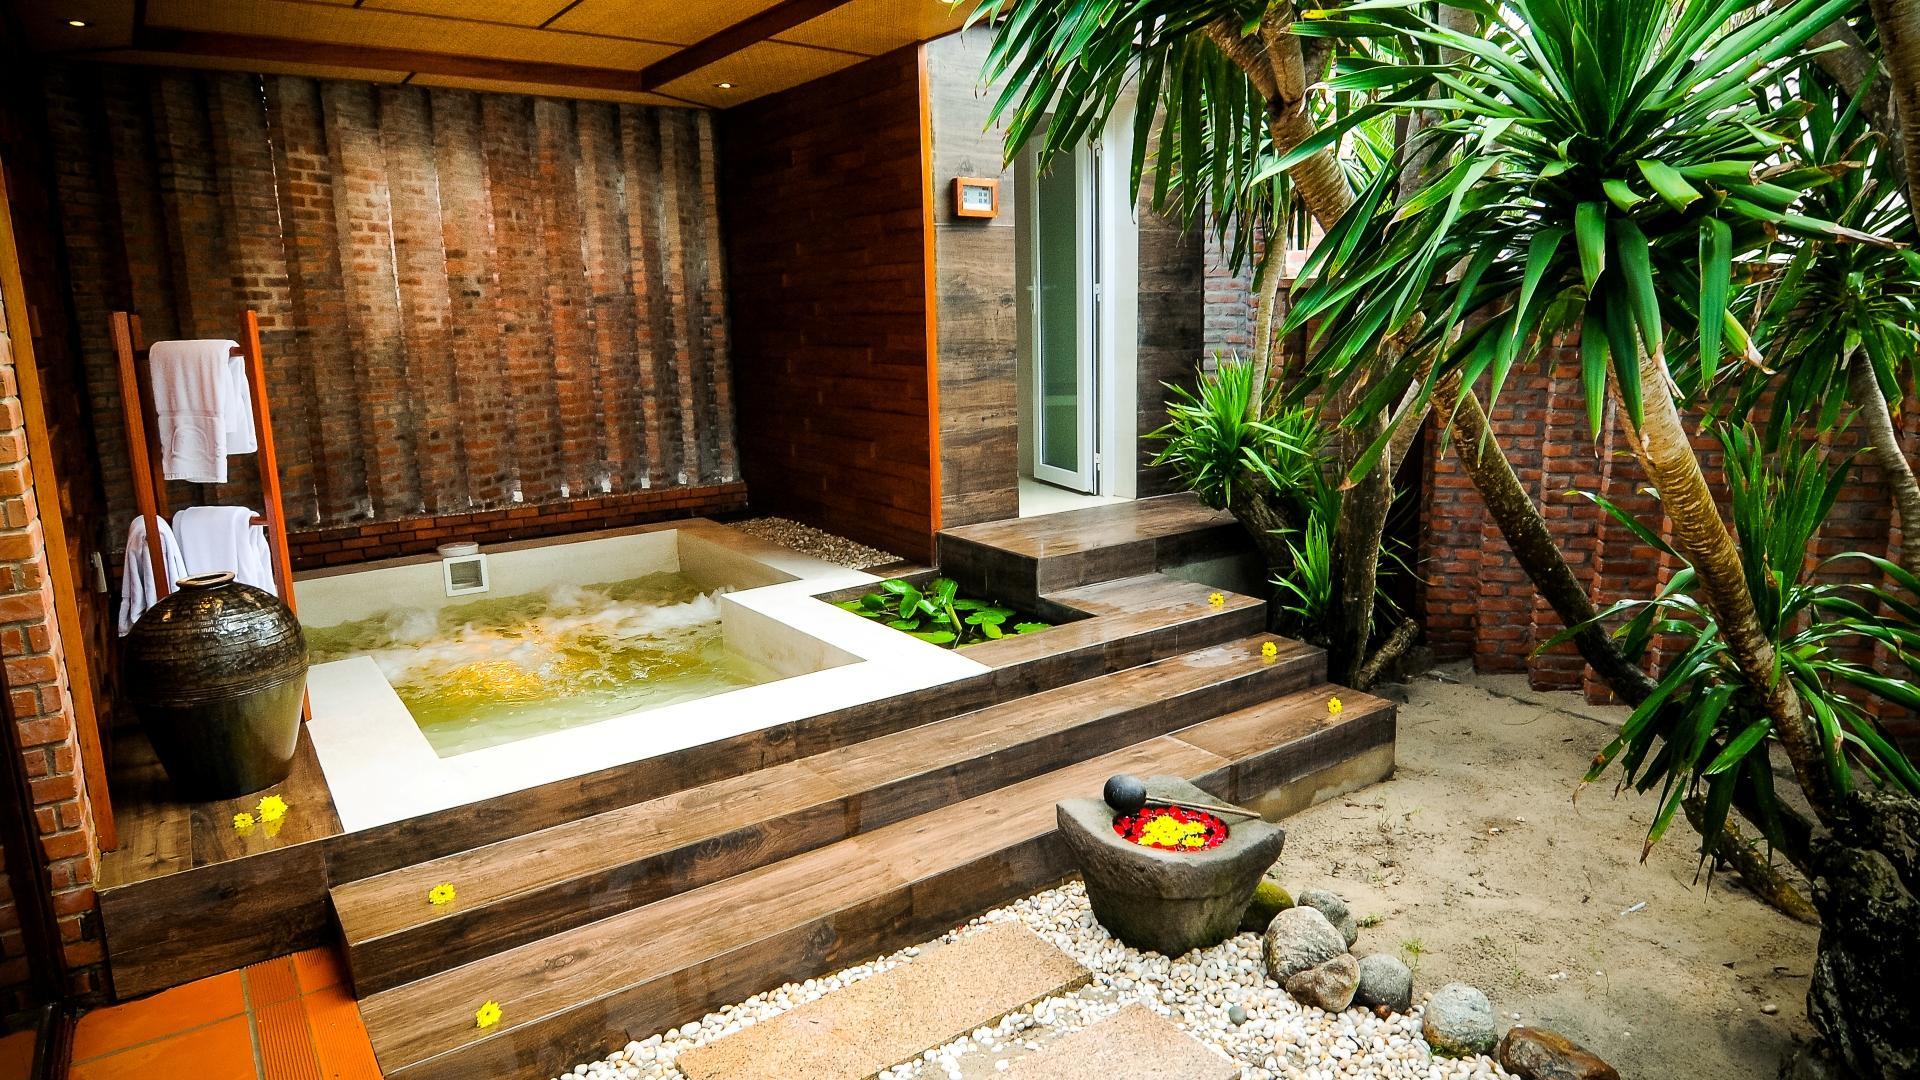 Hotels Worldwide 5 Star Luxury Hotel Dlw Official Site Hoi An Vietnam Cua Dai Beach